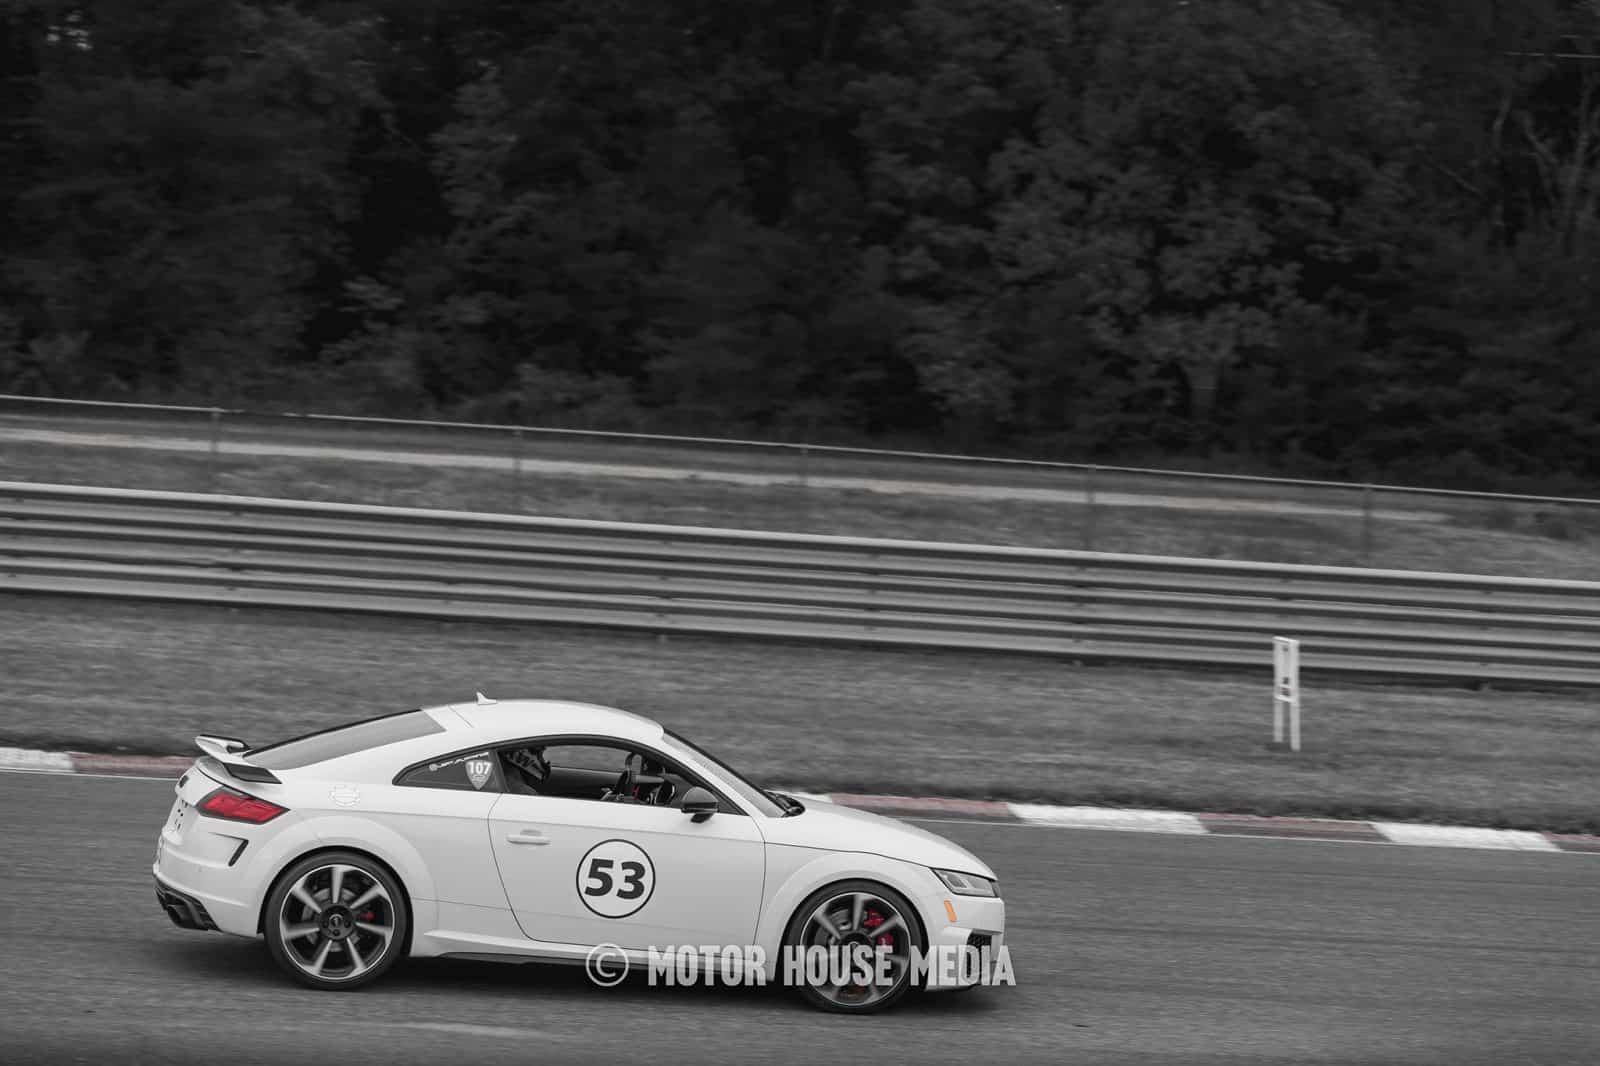 Audi roll racing